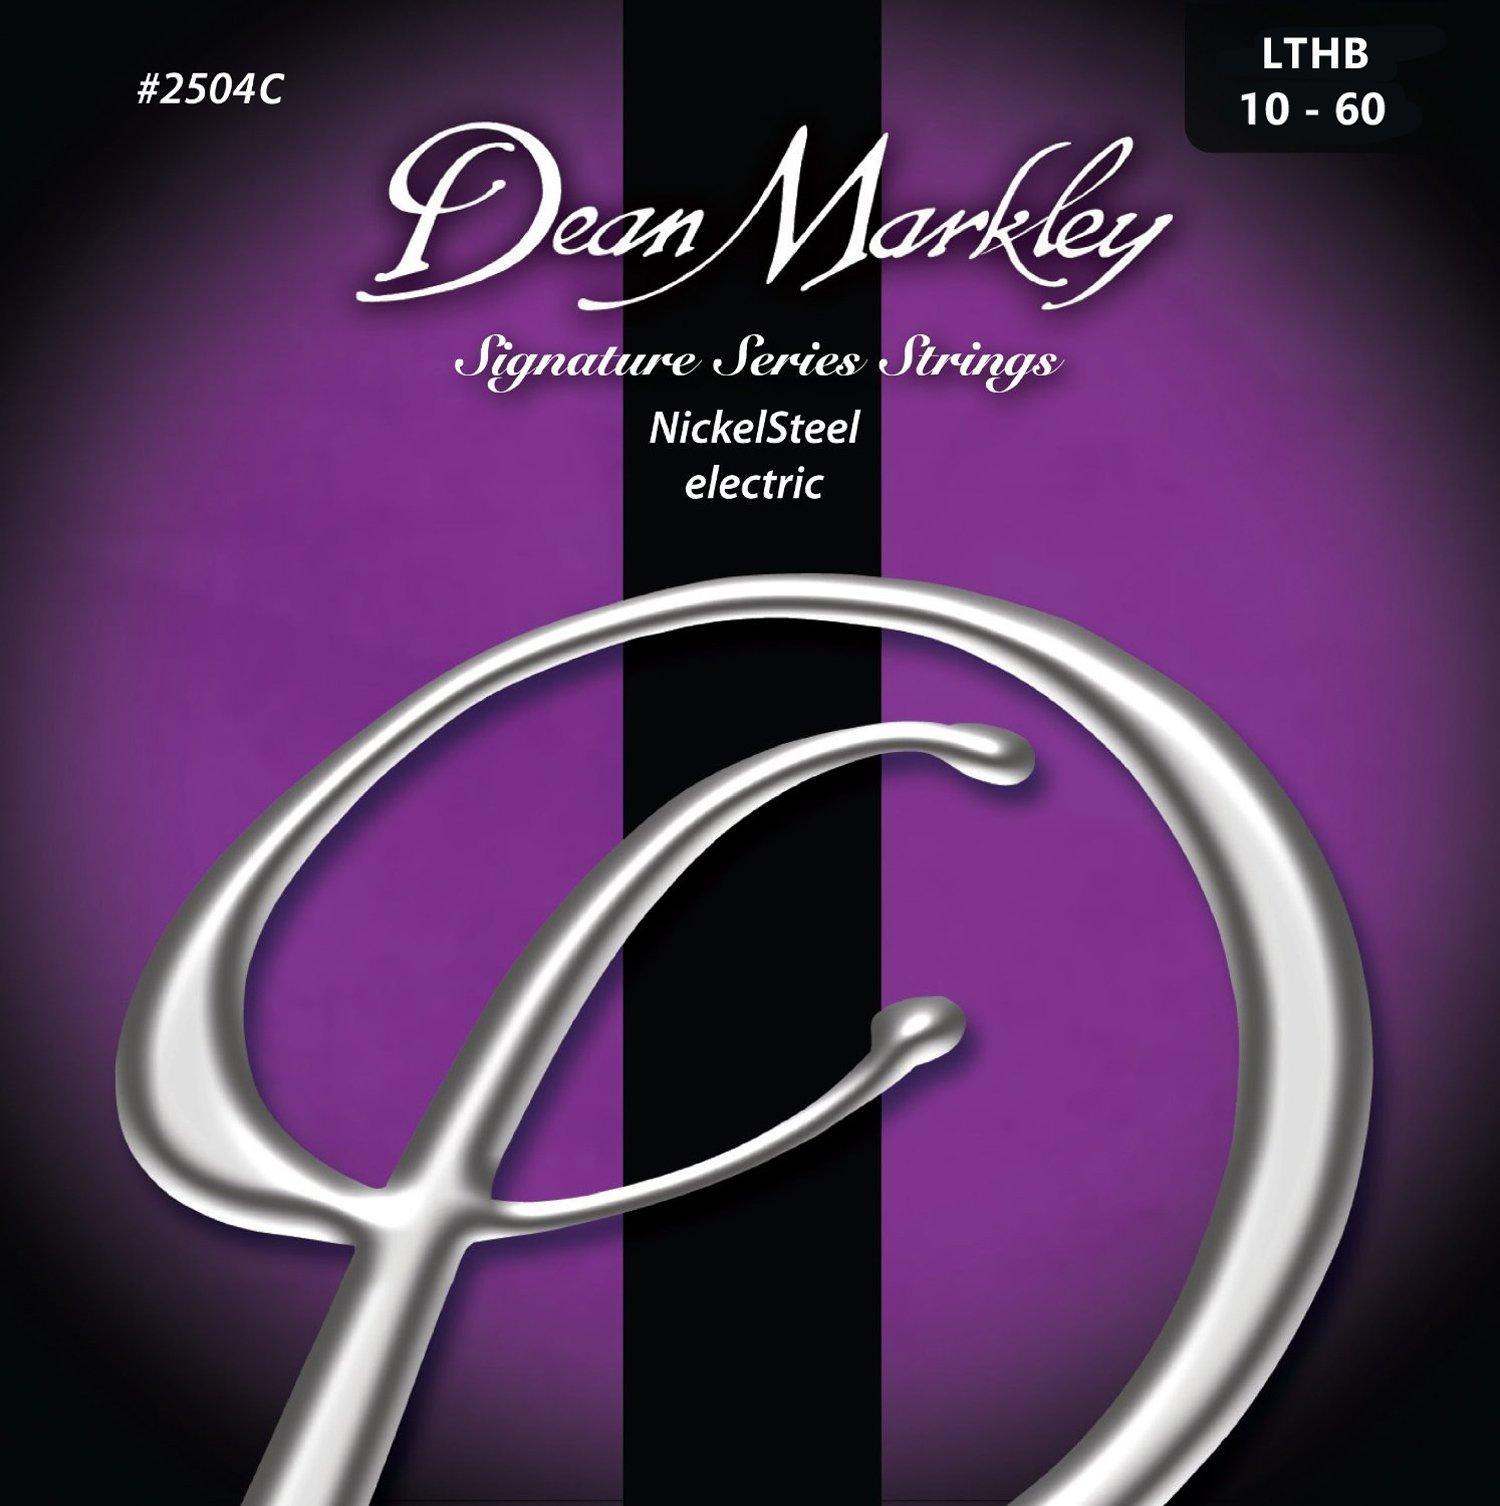 Dean Markley 7-String NickelSteel Signature Series Electric Guitar Strings, 10-60, 2504C, Light Top/Heavy Bottom